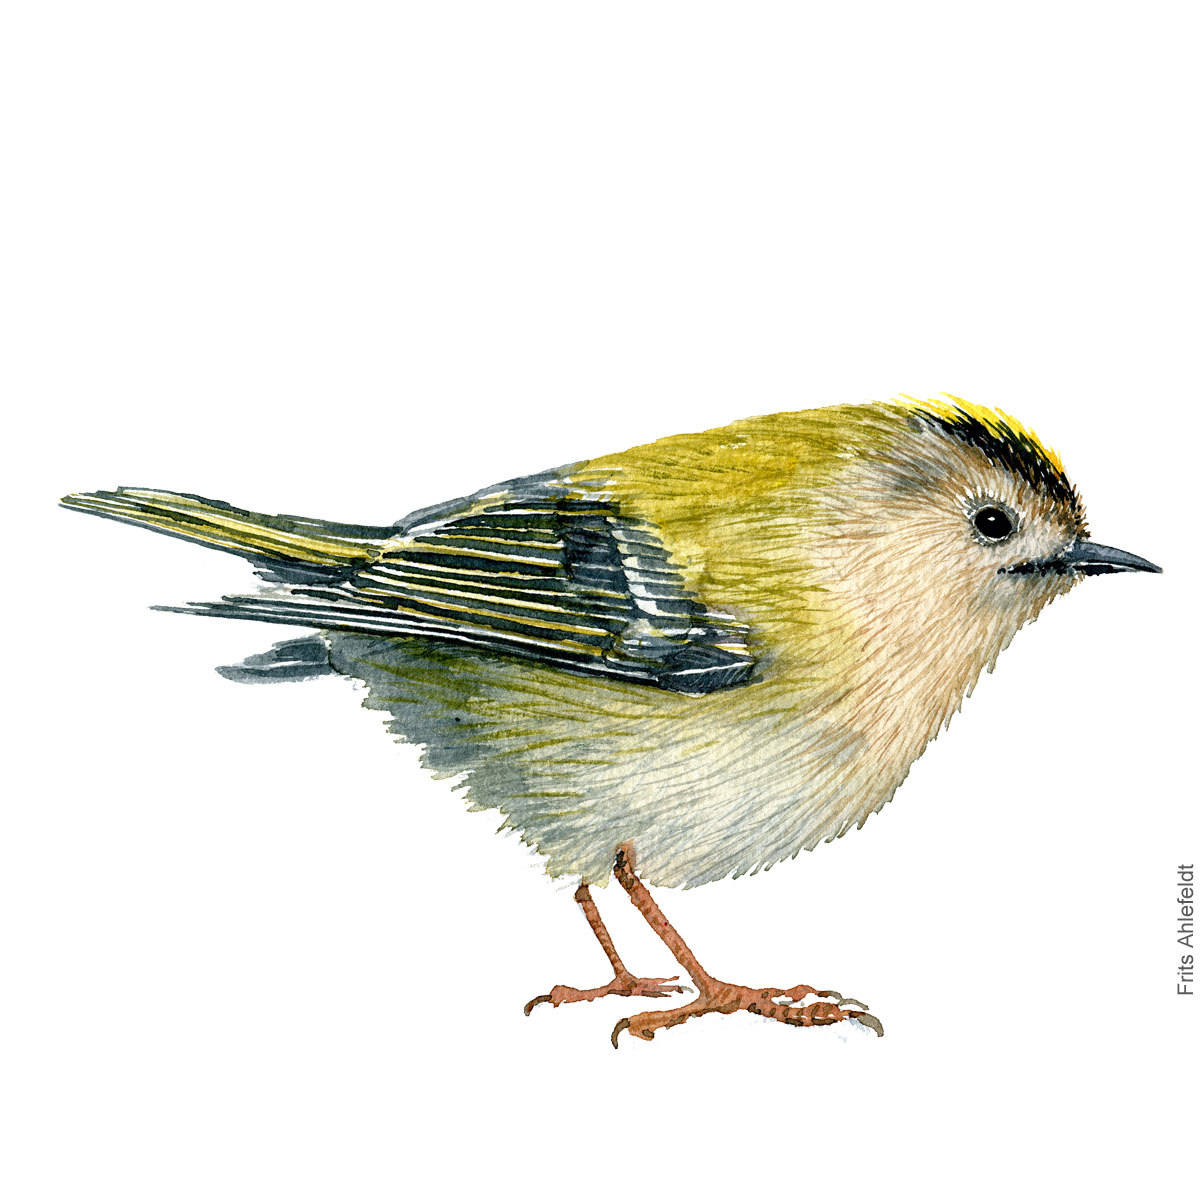 Goldcrest - Fuglekonge akvarel. Watercolor painting by Frits Ahlefeldt